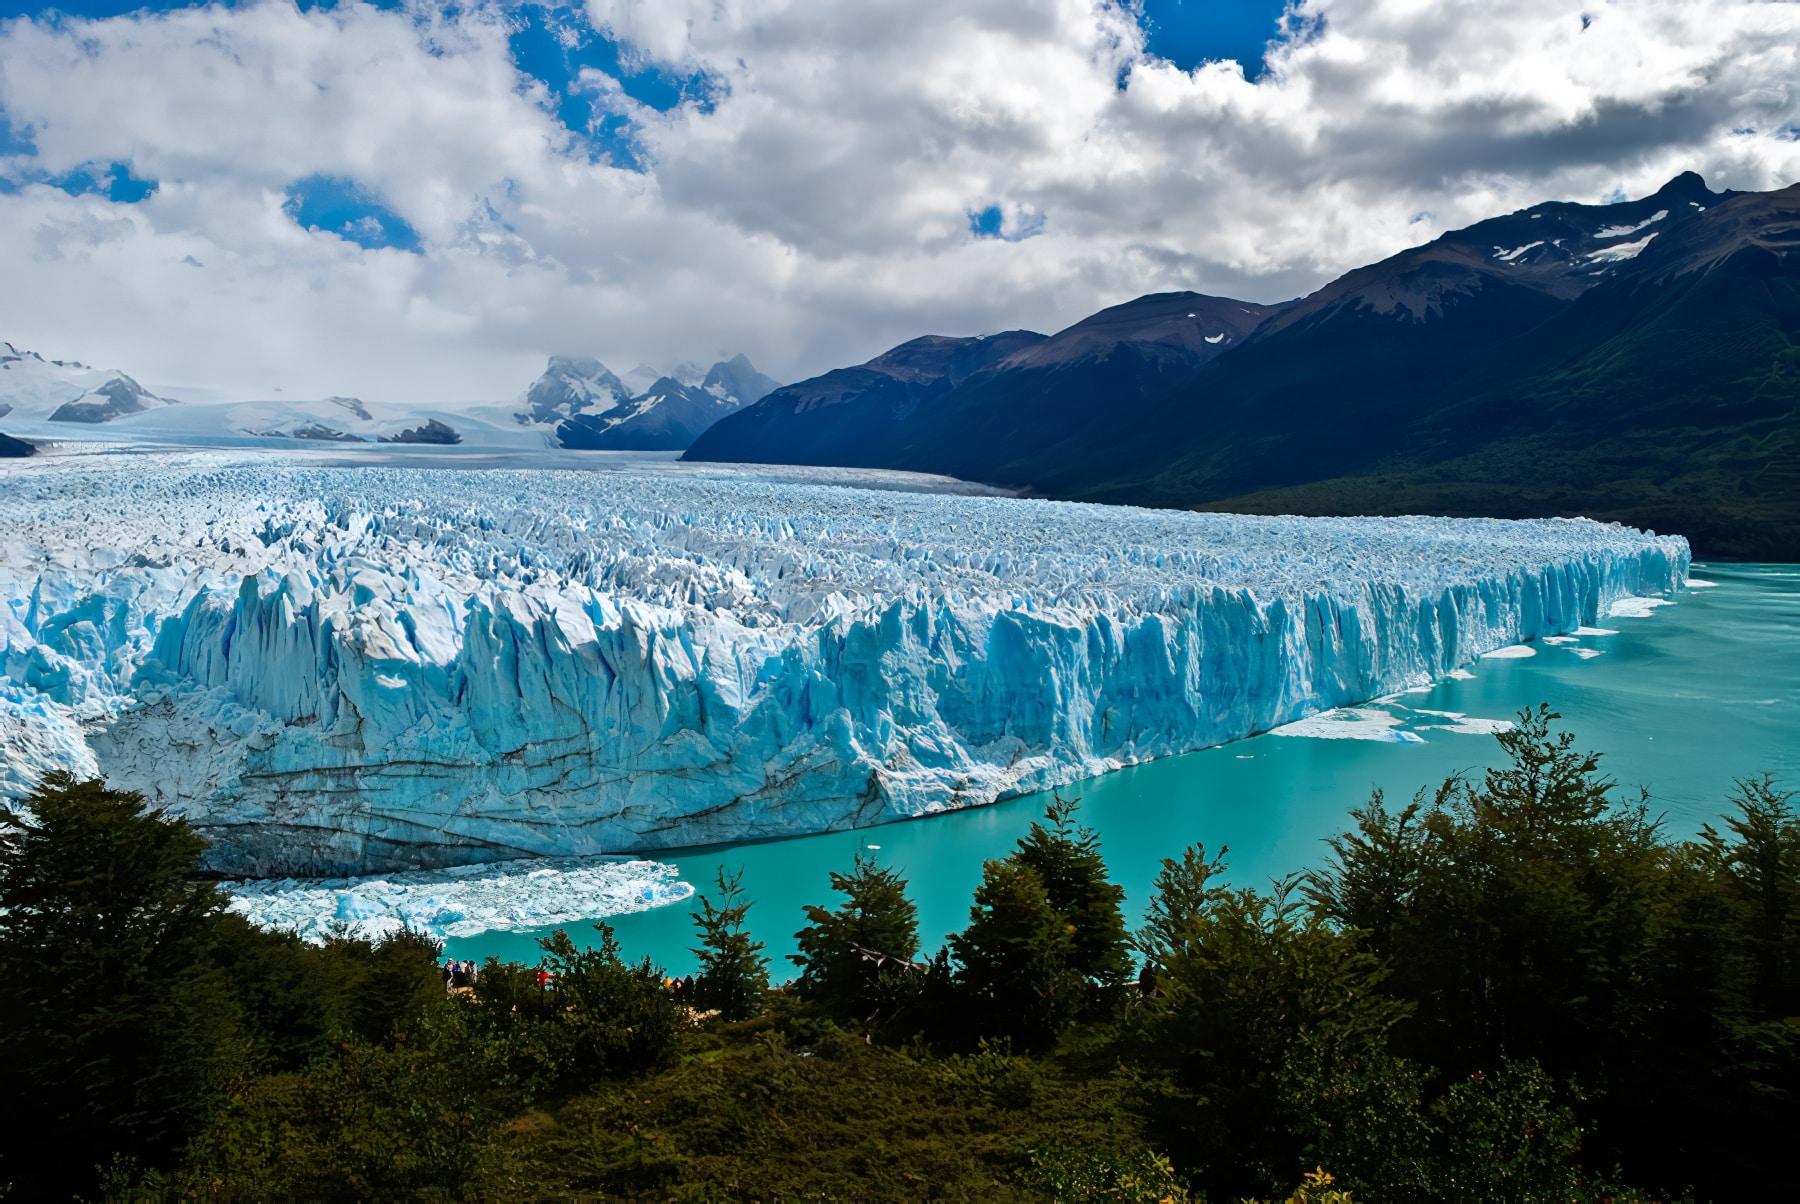 les plus beaux endroits visiter en patagonie guide generation voyage. Black Bedroom Furniture Sets. Home Design Ideas